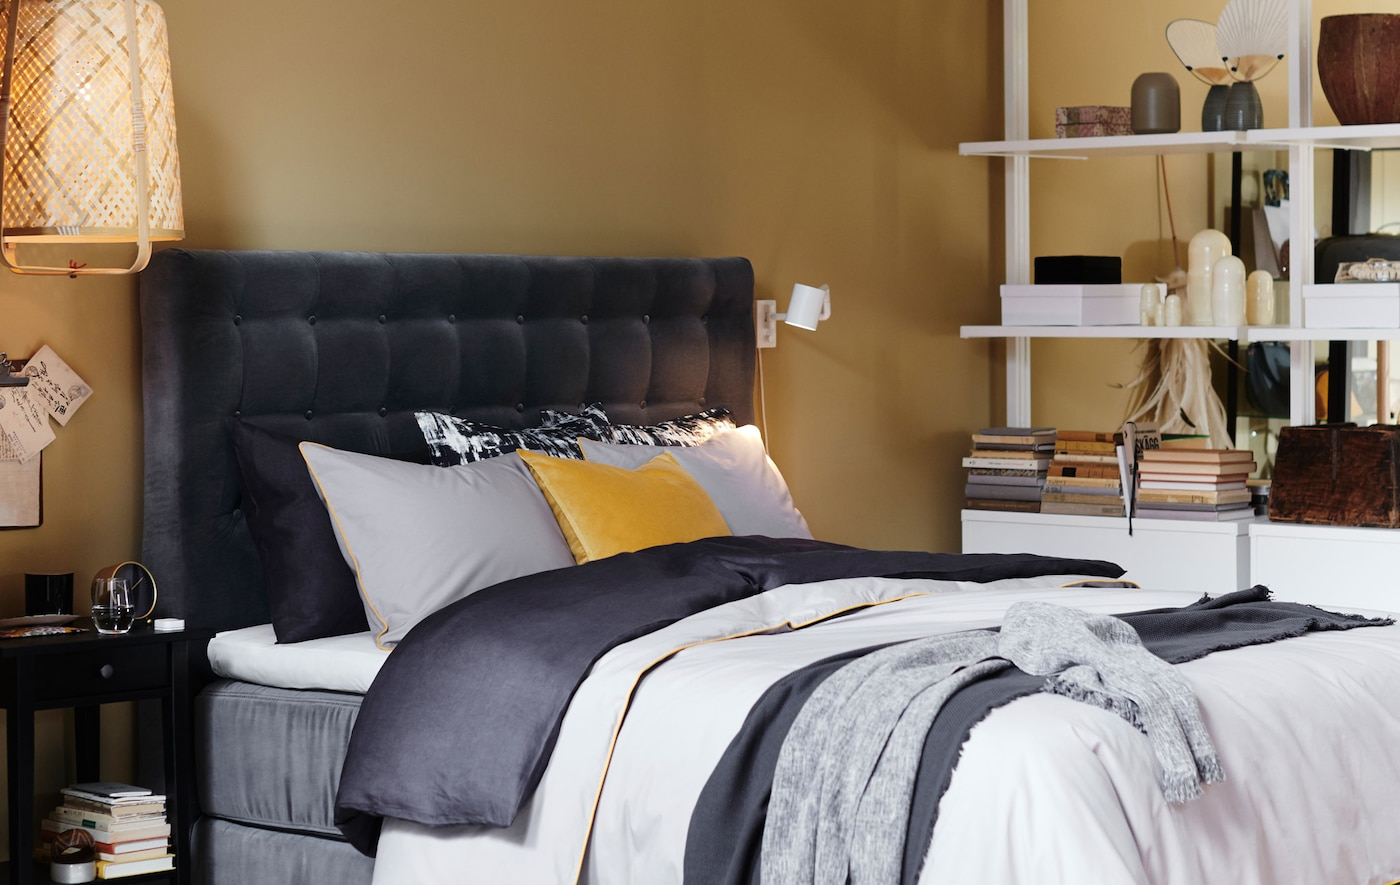 Krevet sa sivim somotnim štepanim uzglavljem i slojevitom posteljinom.